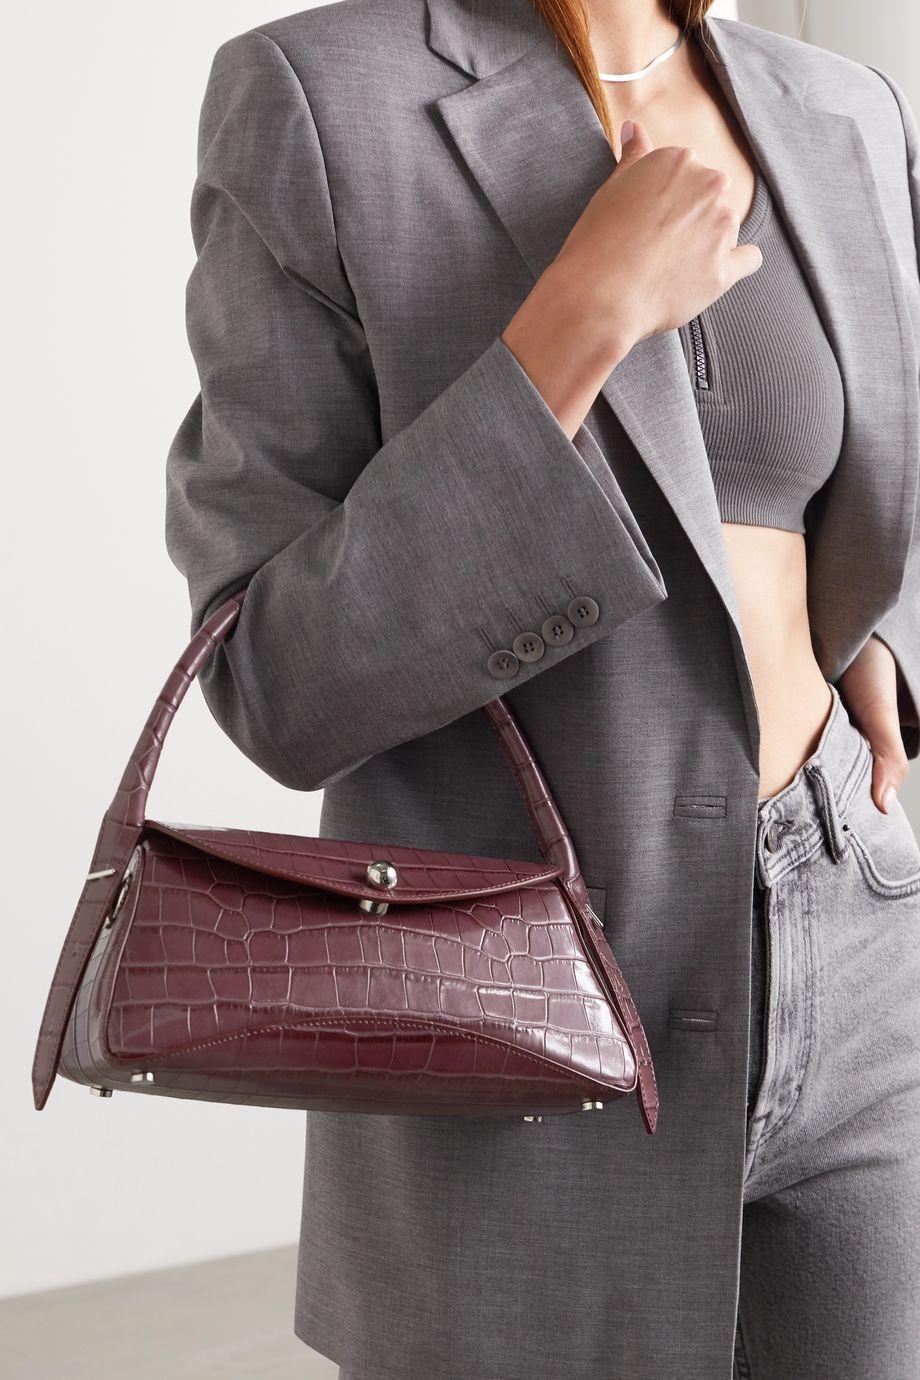 Ratio et Motus Cosmo croc-effect leather shoulder bag